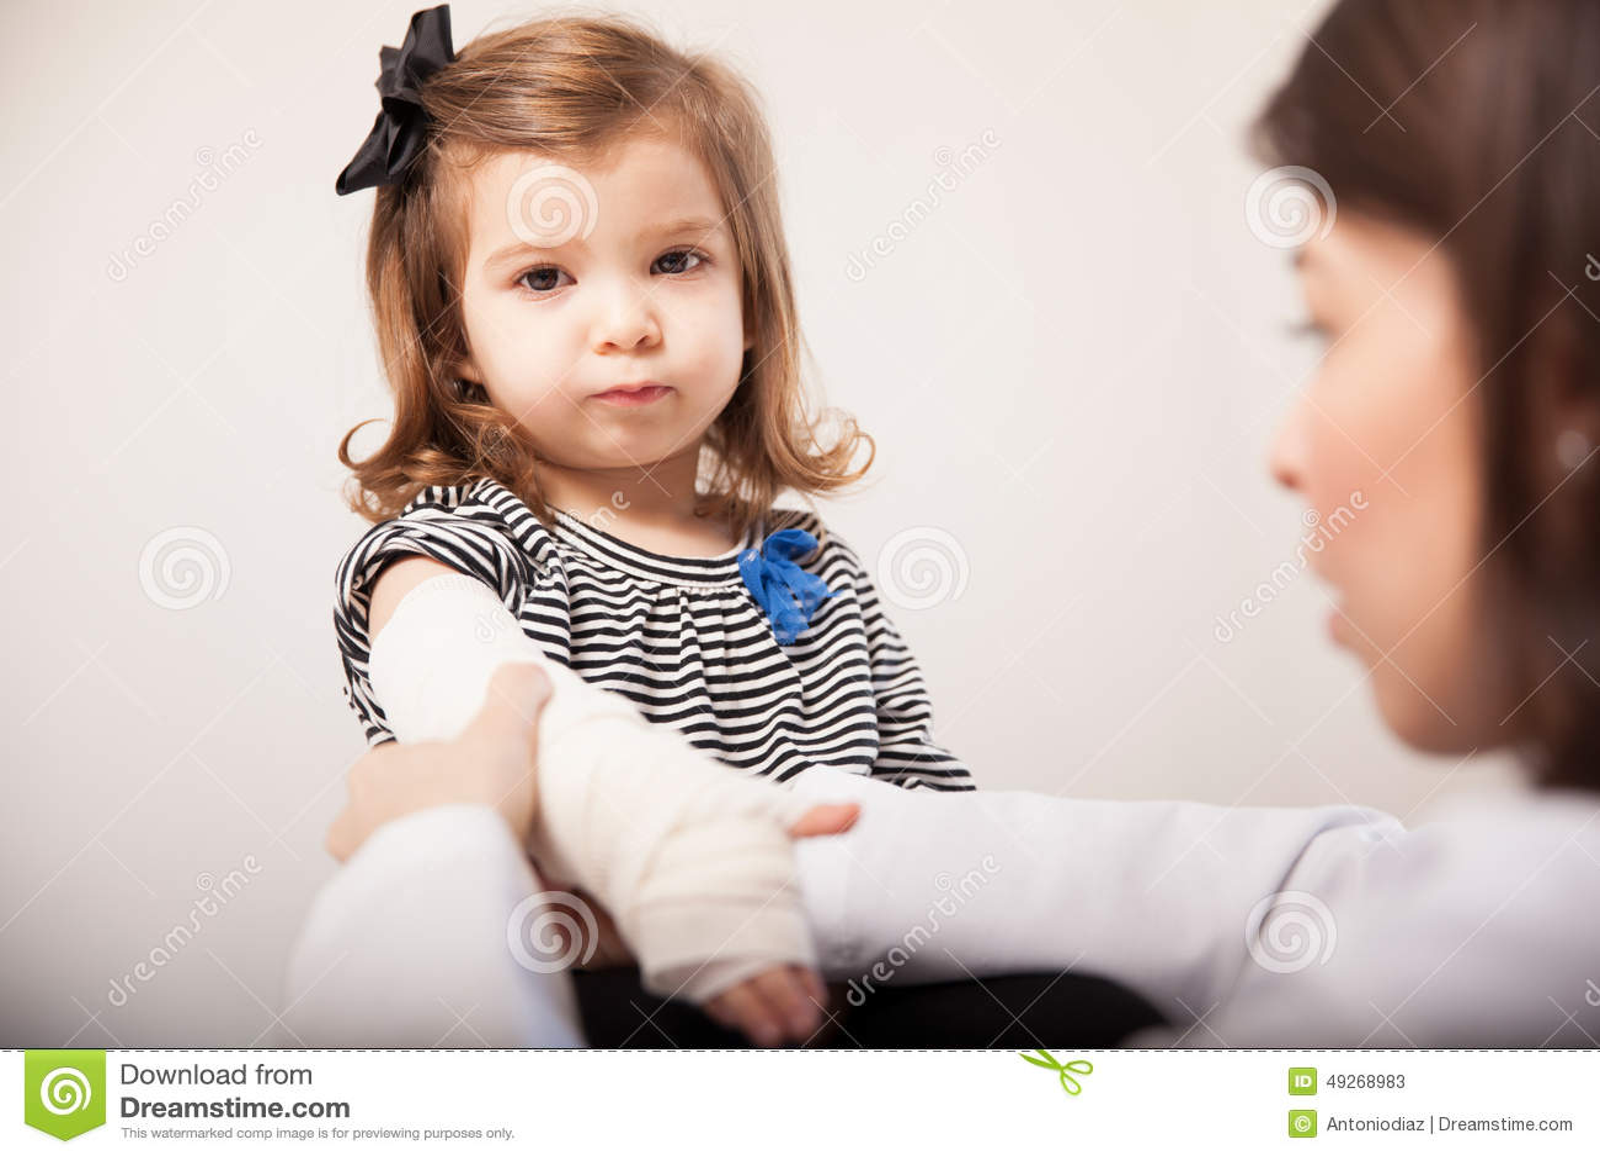 little girls getting anal